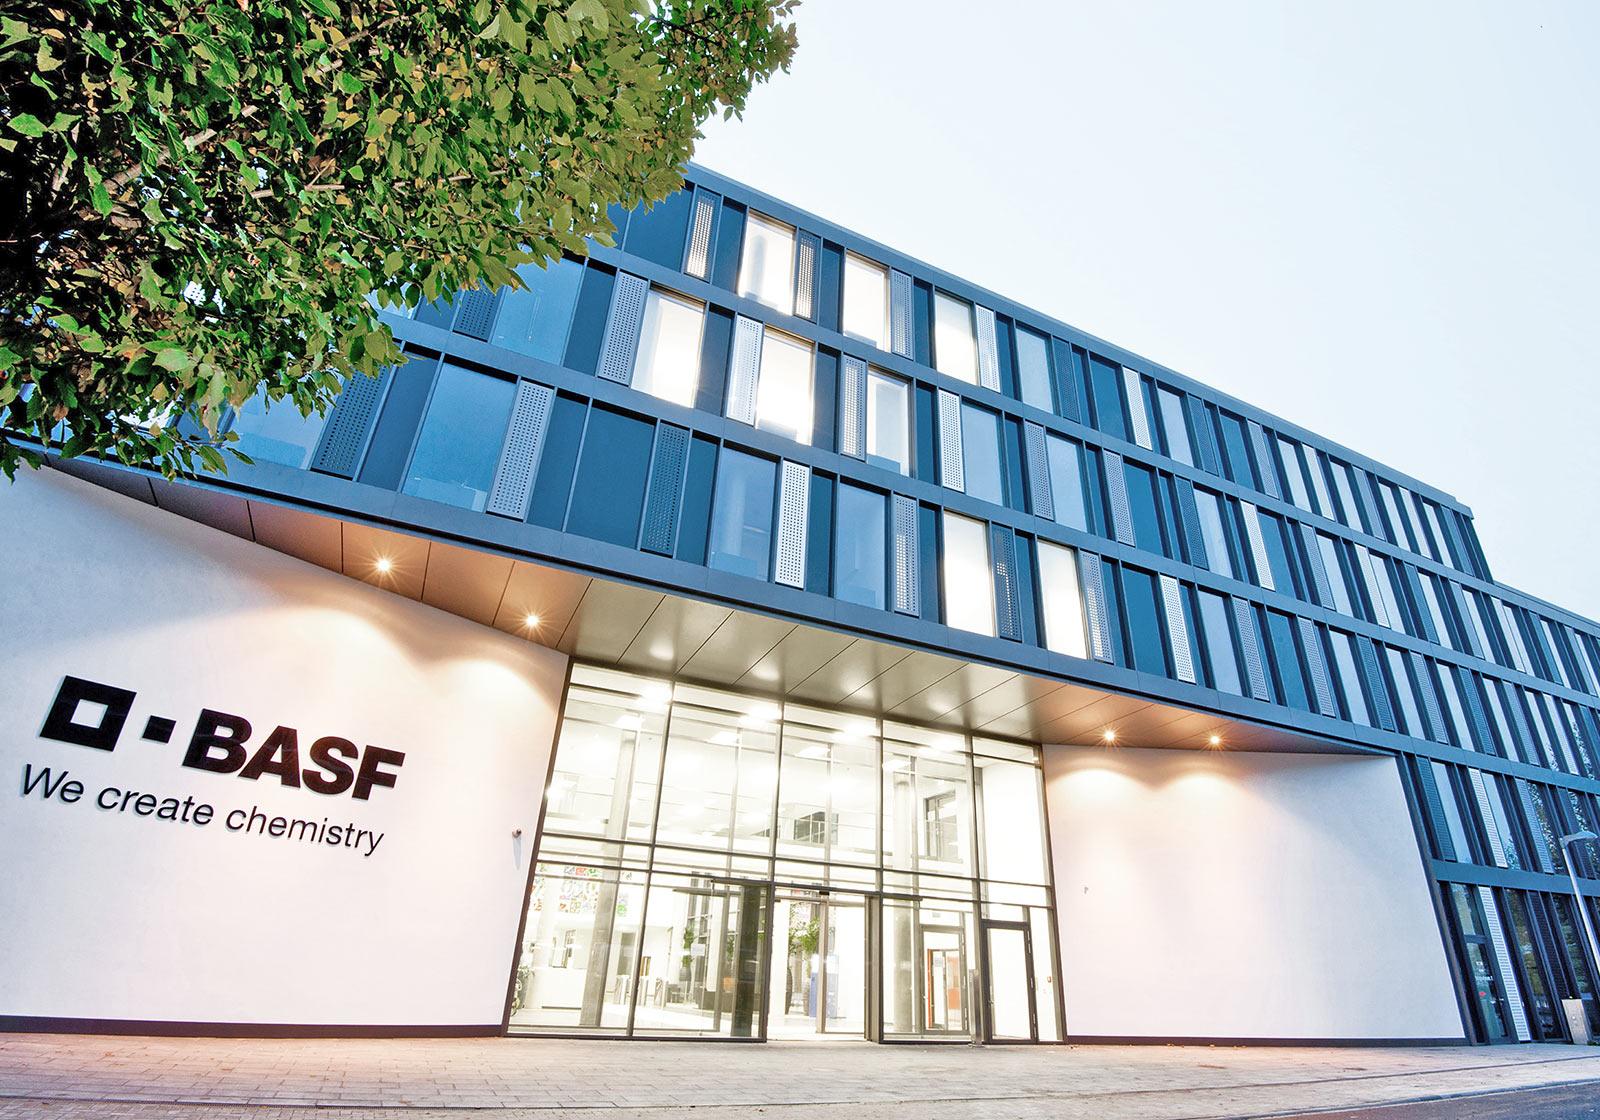 Foto: BASF SE / Marcus Schwetasch